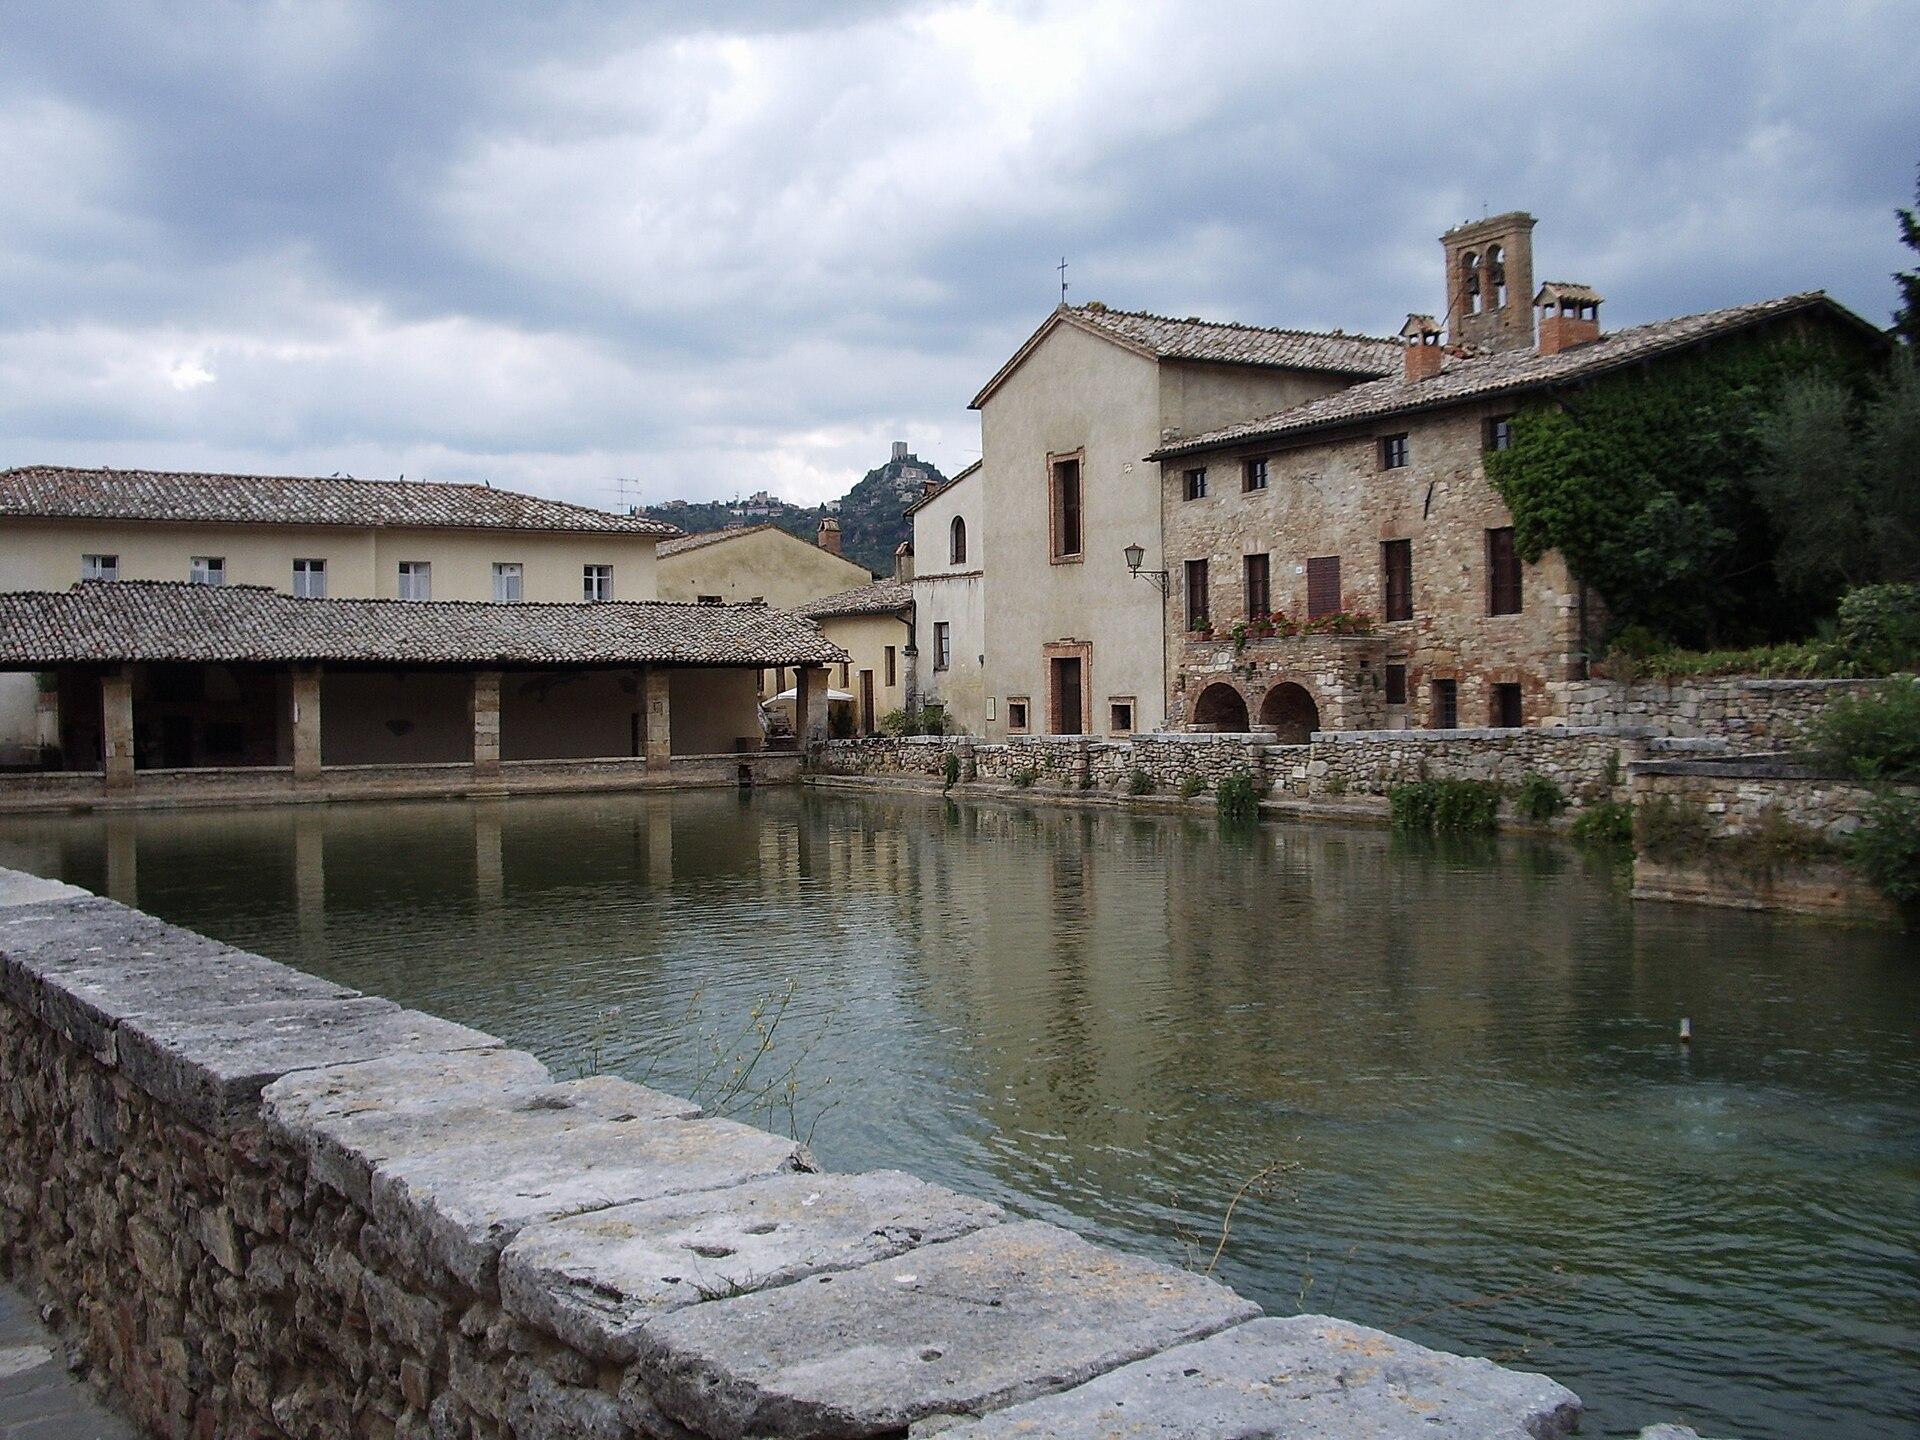 Bagno vignoni wikip dia - Agriturismo bagno vignoni terme ...